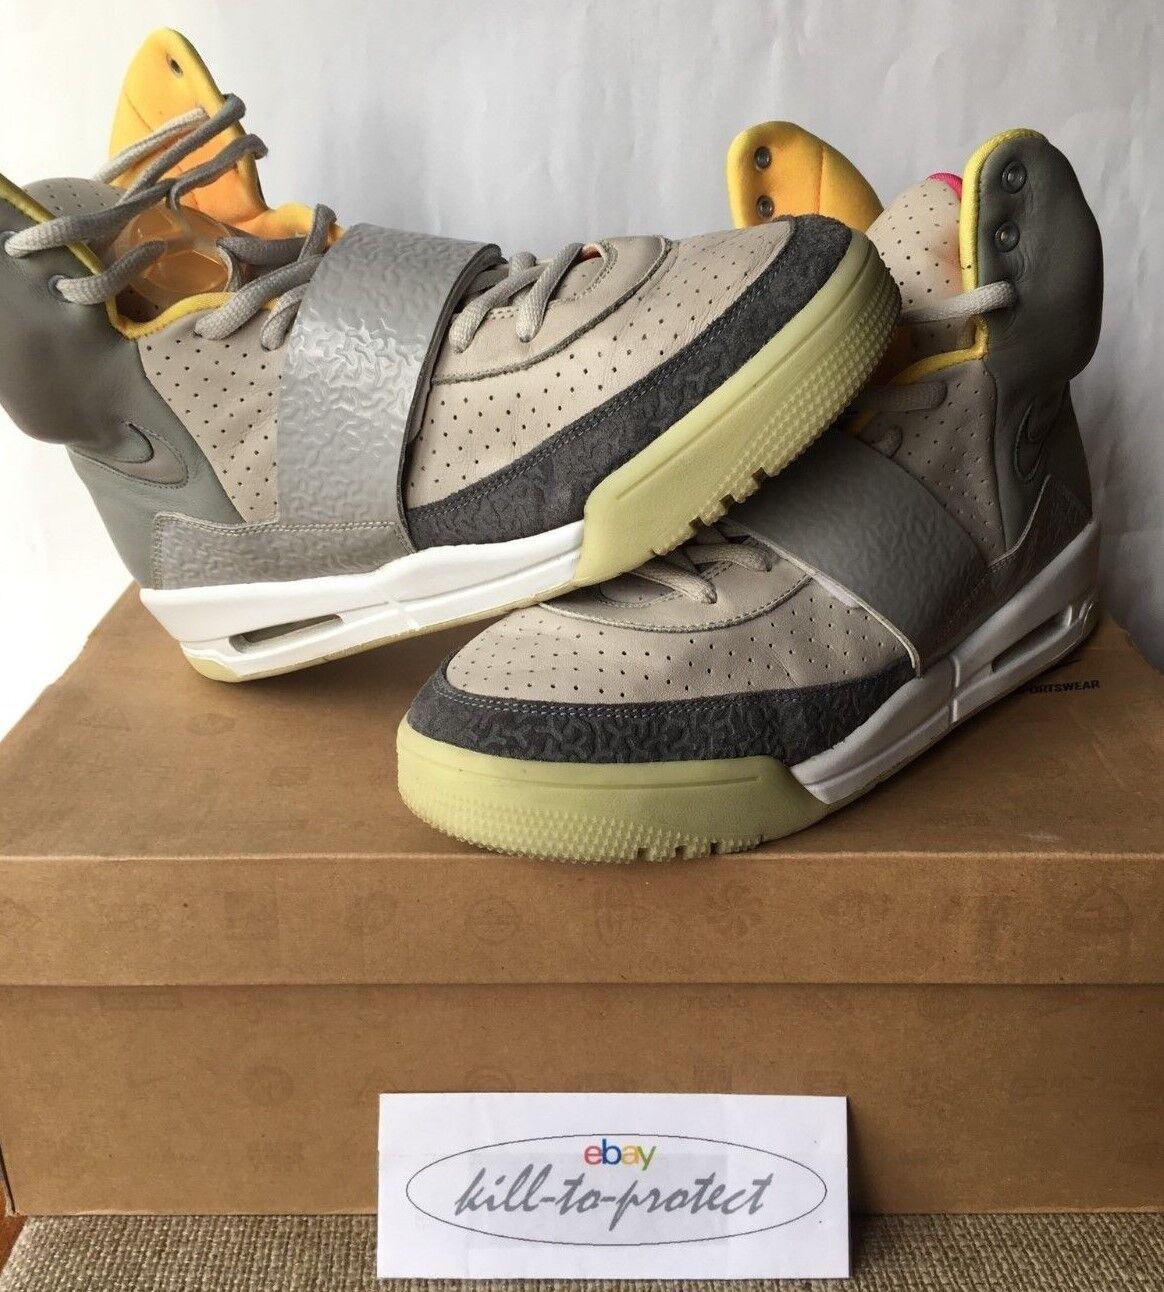 9b4cfc2536cc85 Nike Air Yeezy 1 One Zen Grey US 10 UK 9 Tan 366164-002 Glow Kanye ...